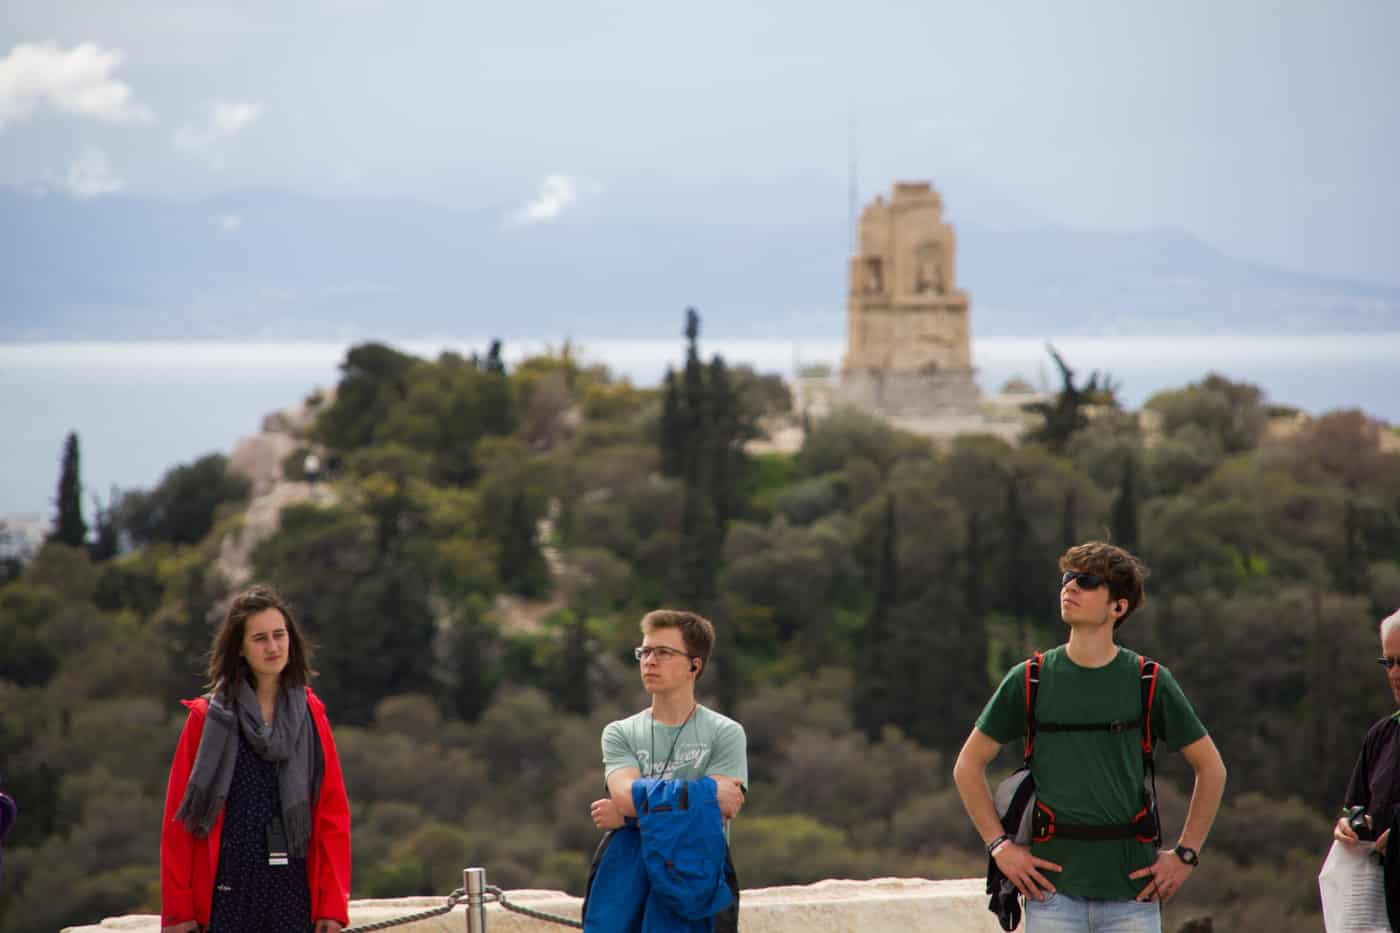 Sth Basel Studienreise Griechenland (59)